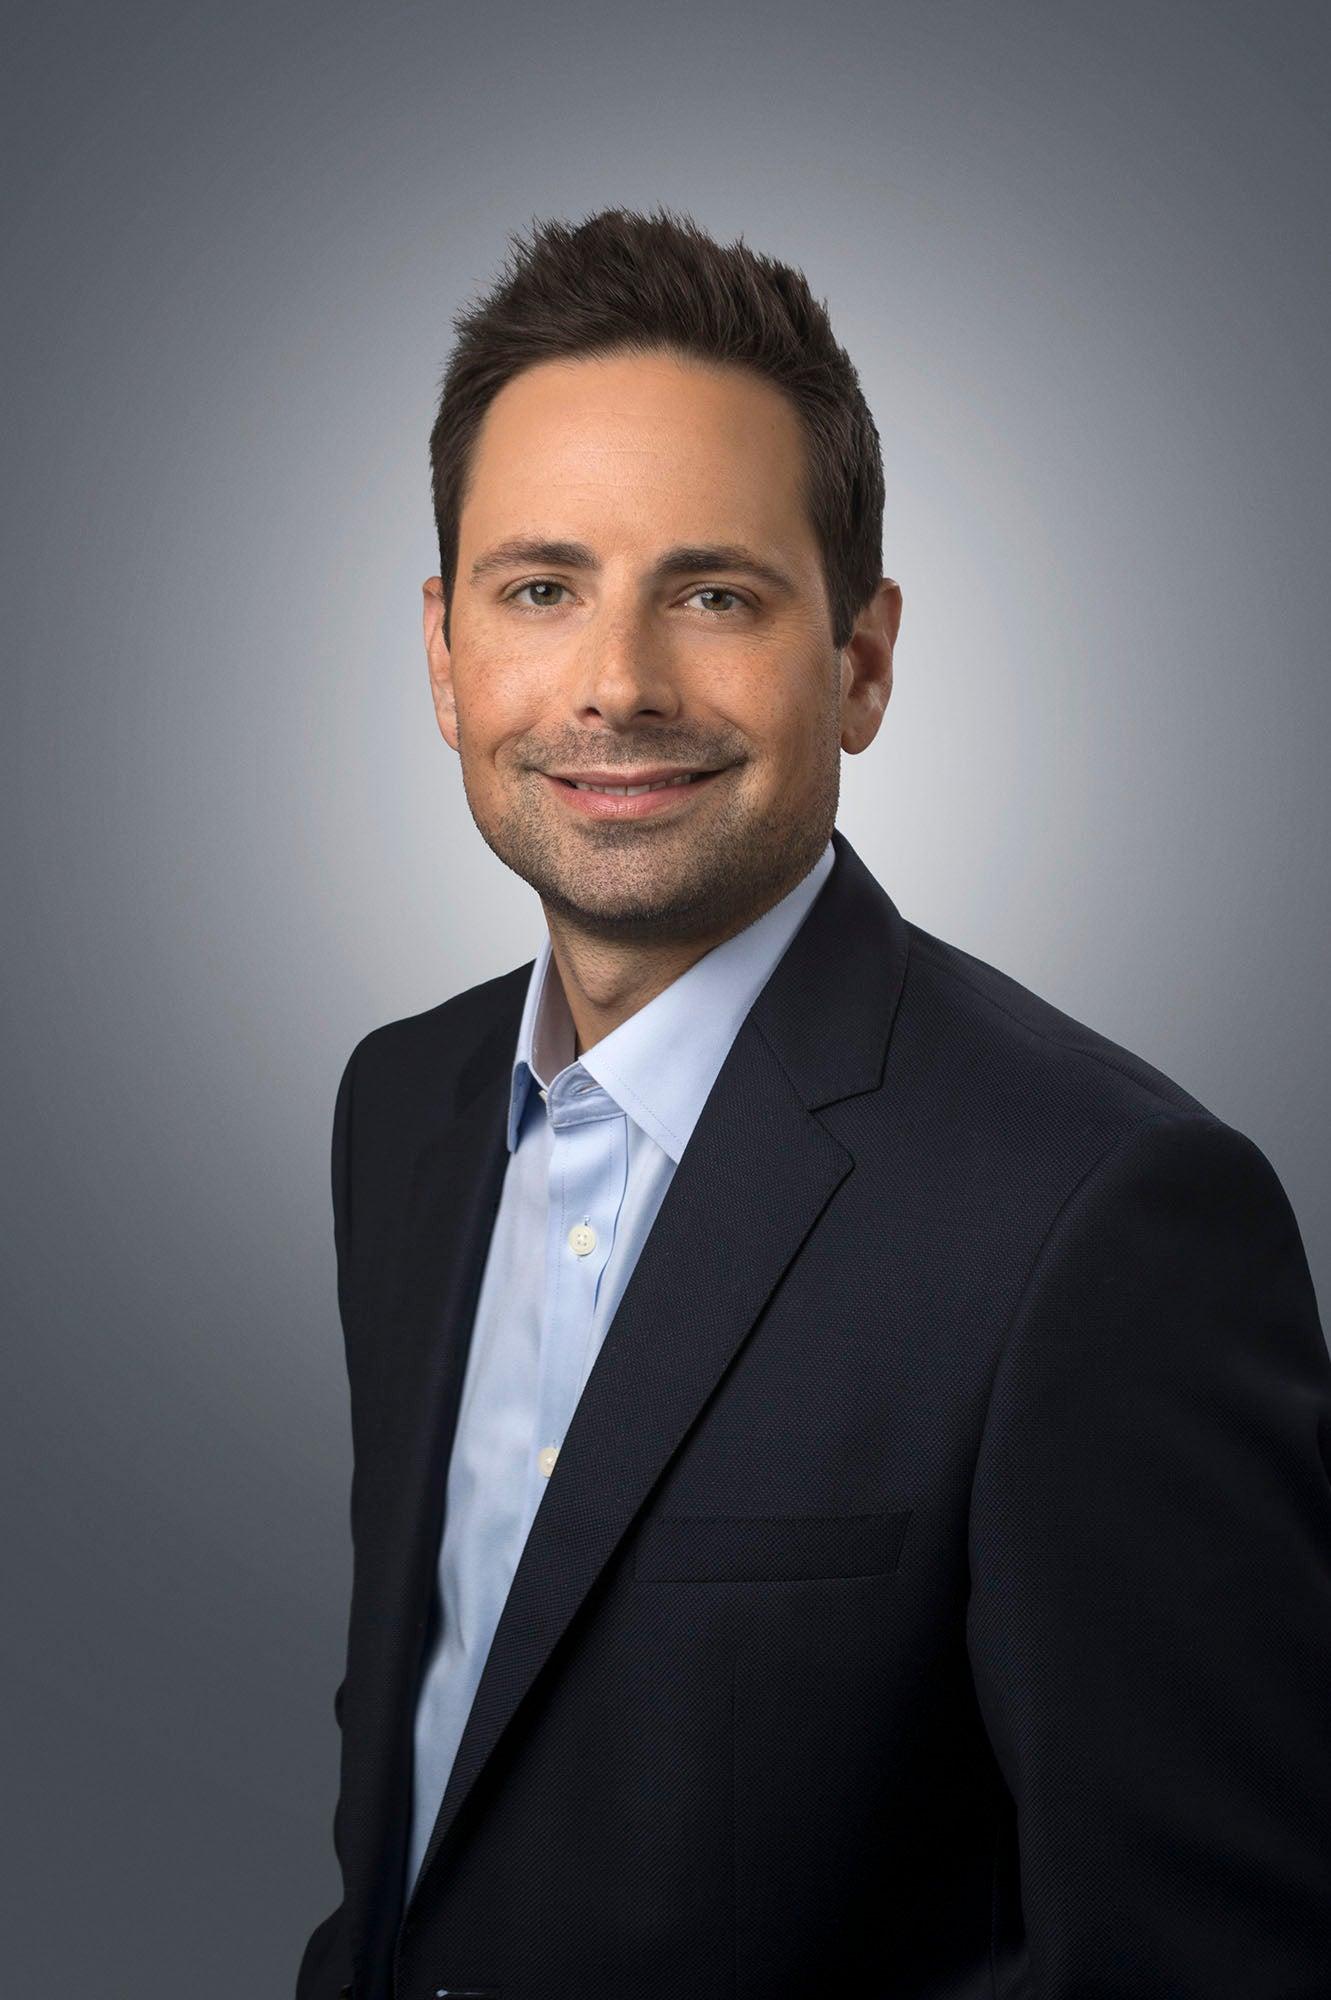 Joseph Giraldi